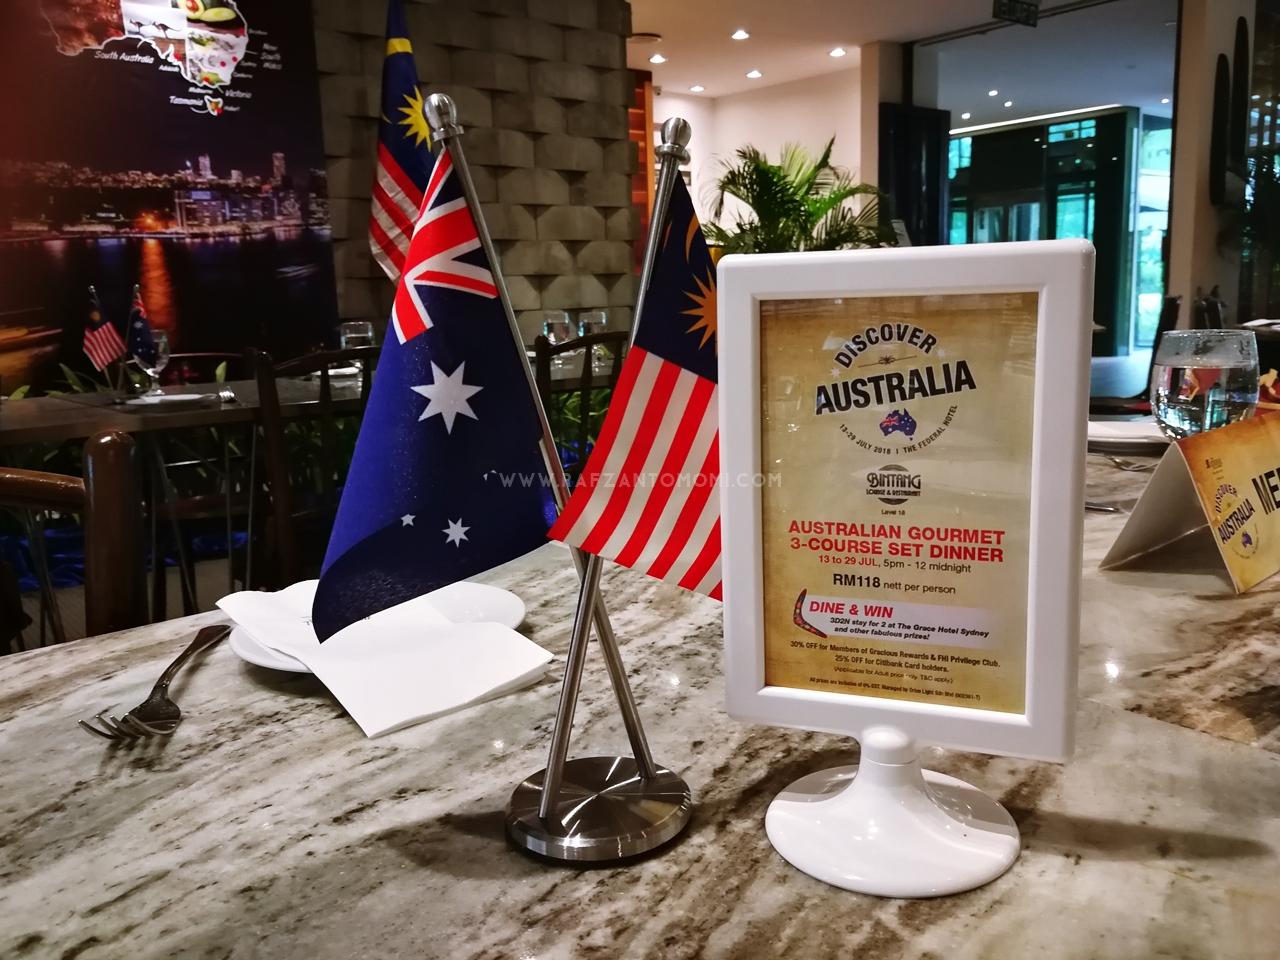 Jom Discover Australia Di The Federal Kuala Lumpur Bermula 13 Julai 2018 - 28 Julai 2018